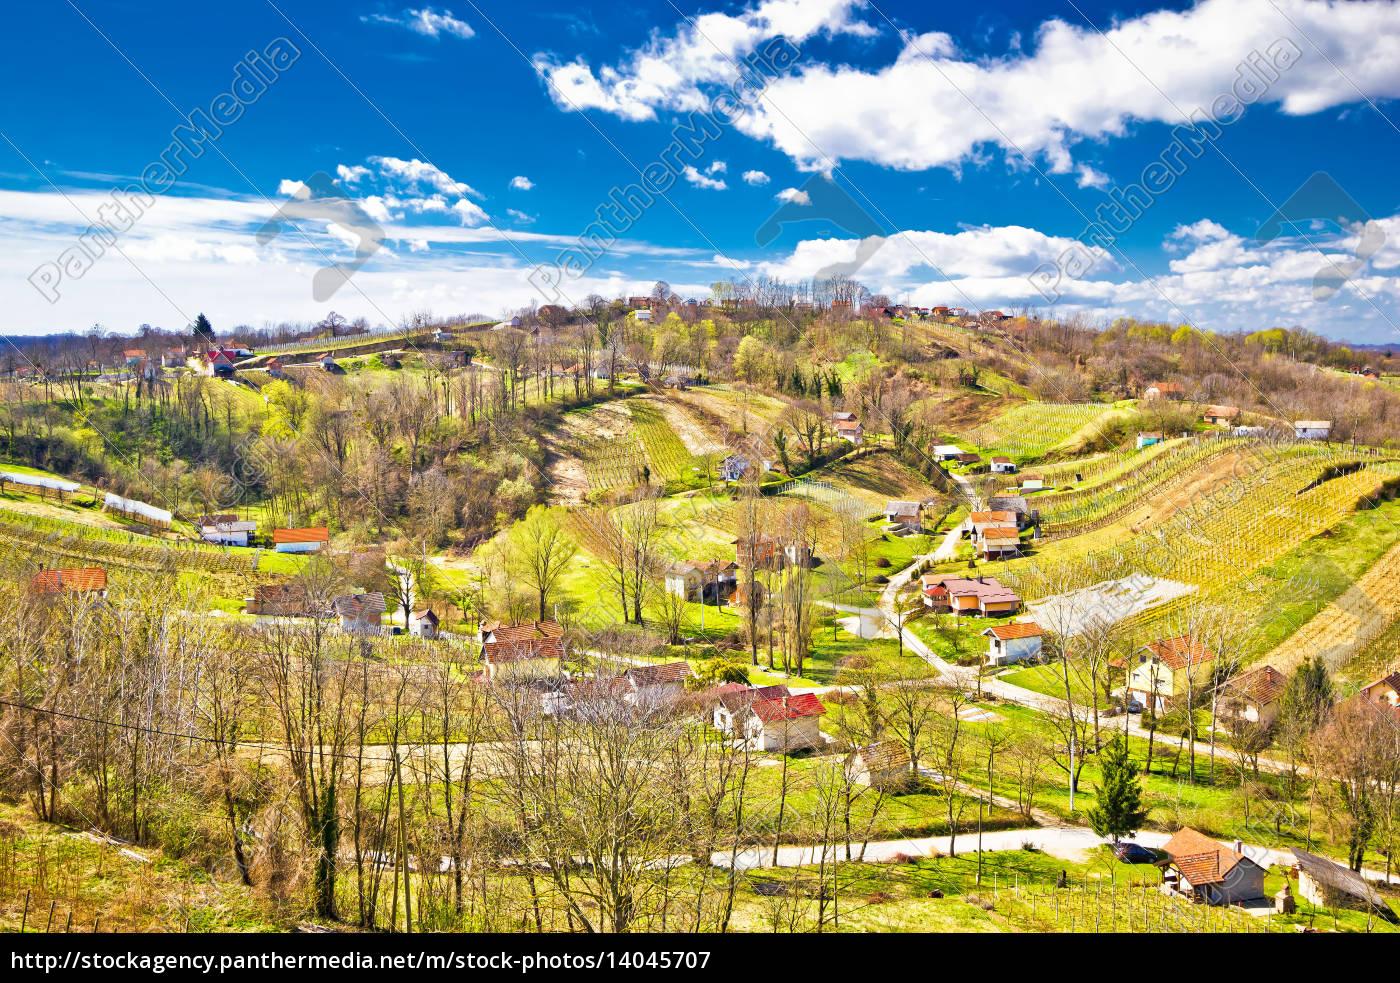 zagorje, region, green, vineyard, hills - 14045707